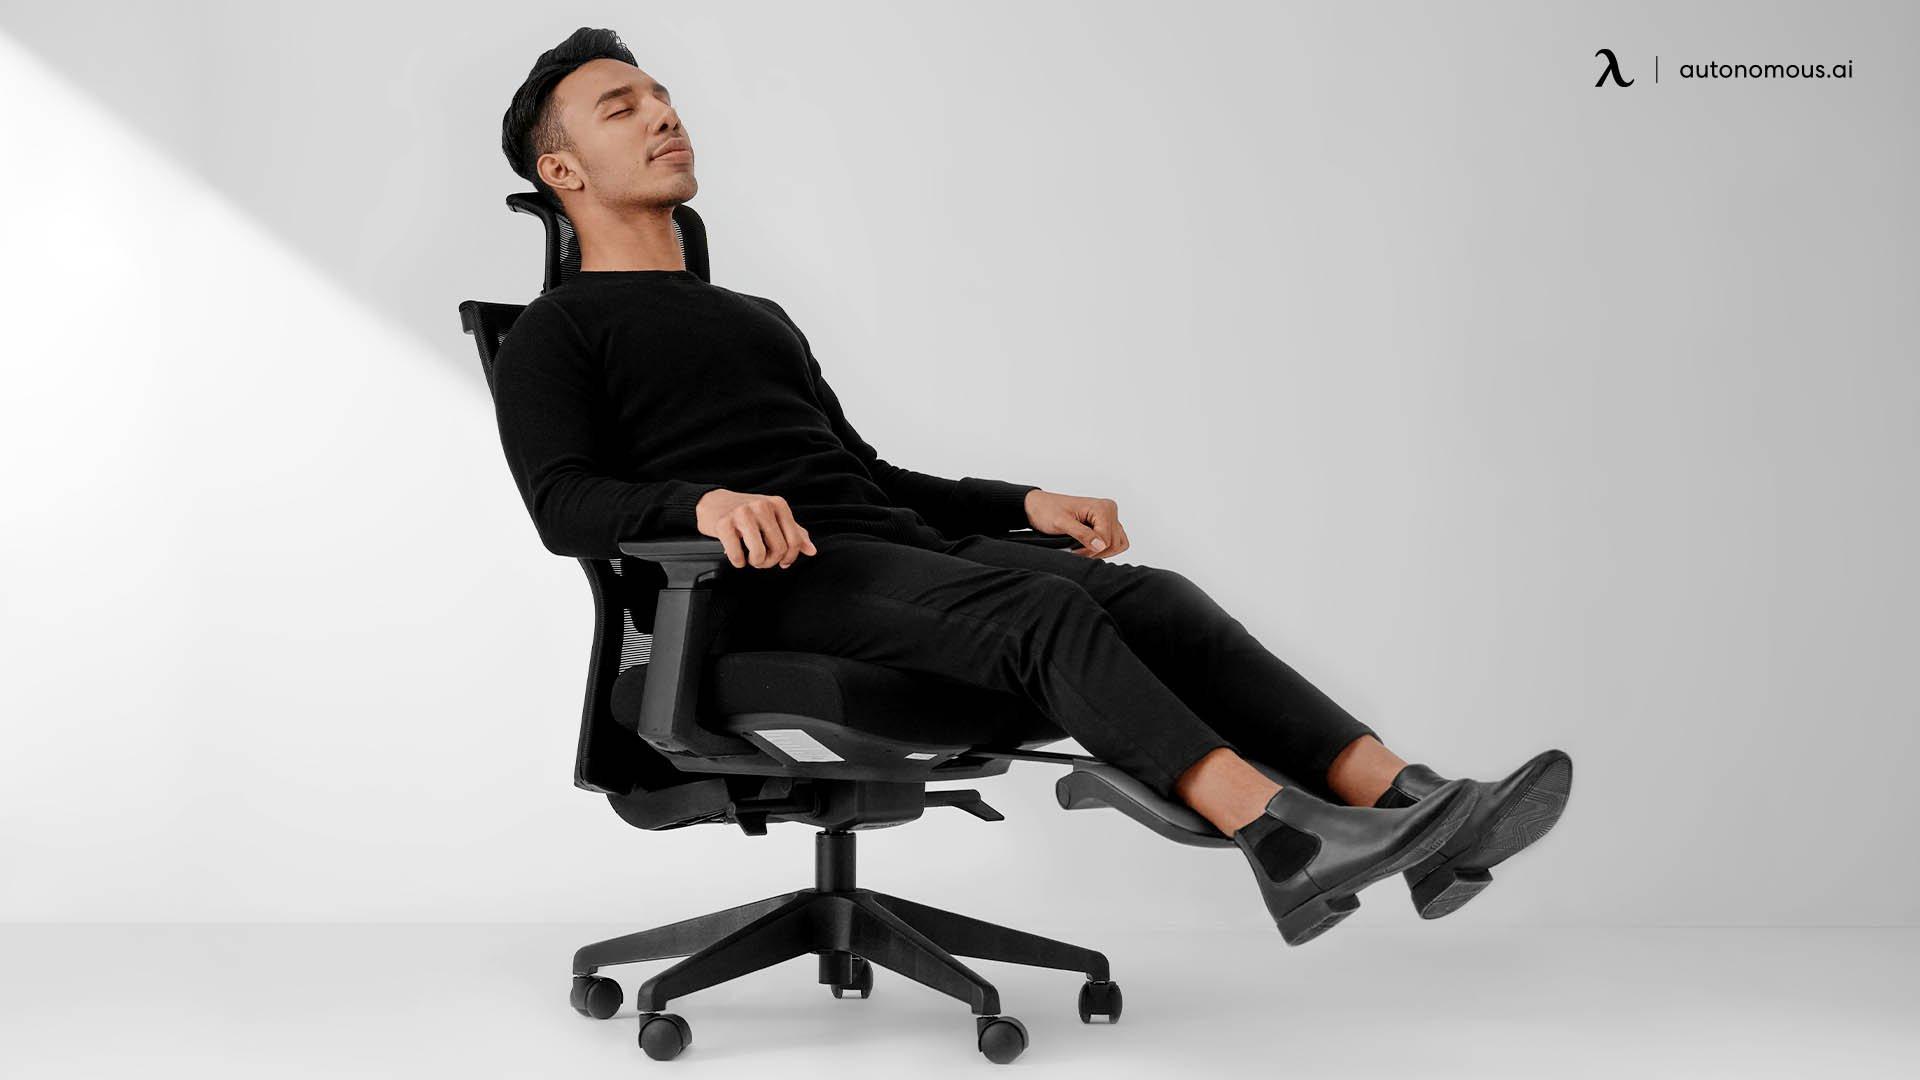 ergonomic problems